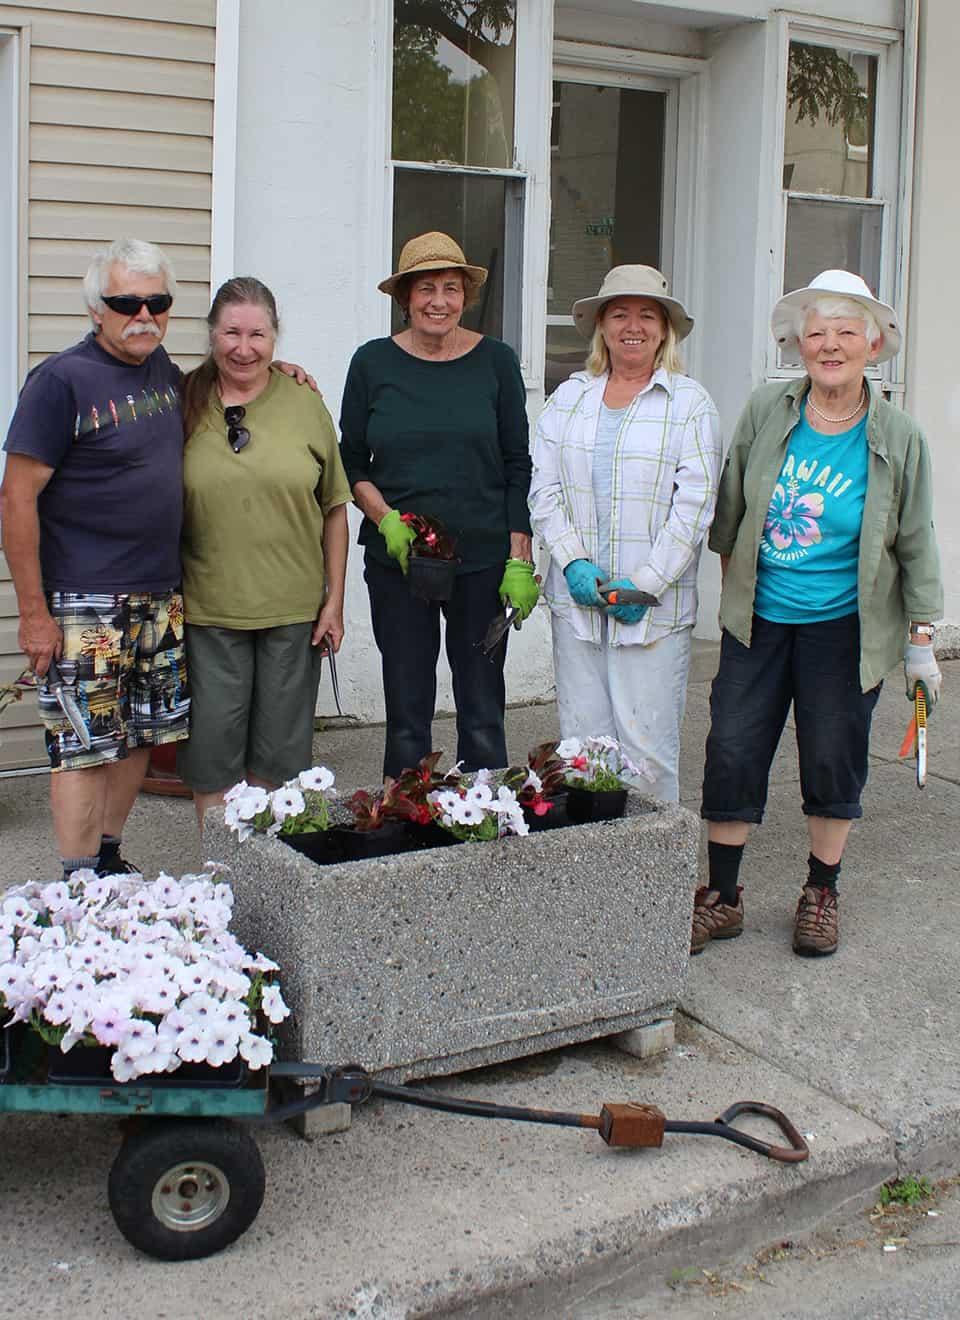 Orono Horticultural Society